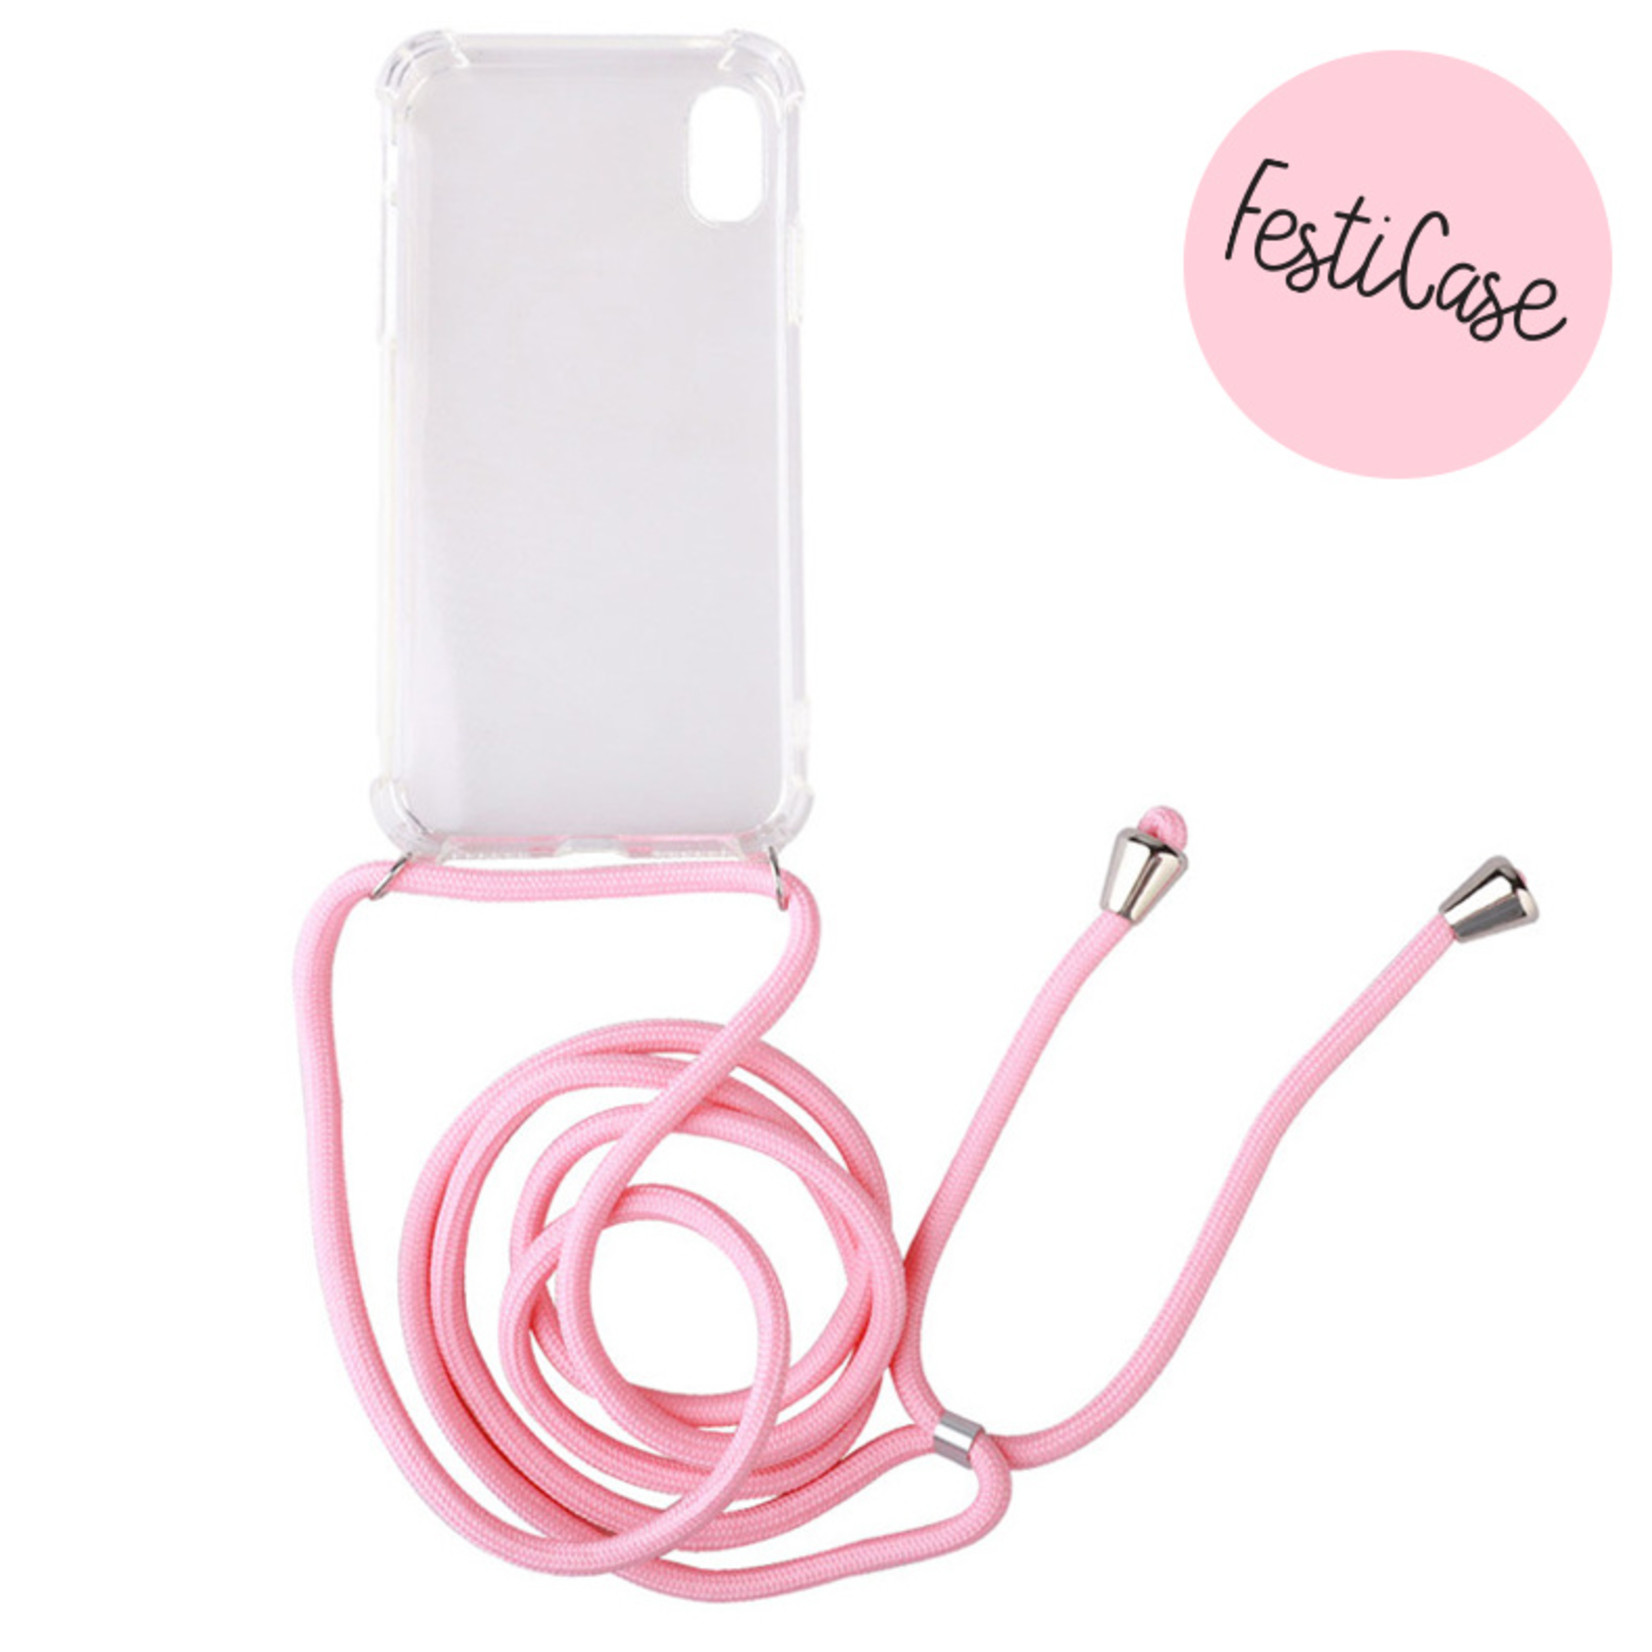 FOONCASE FESTICASE iPhone X Telefoonhoesje met koord (Roze) TPU Soft Case - Transparant